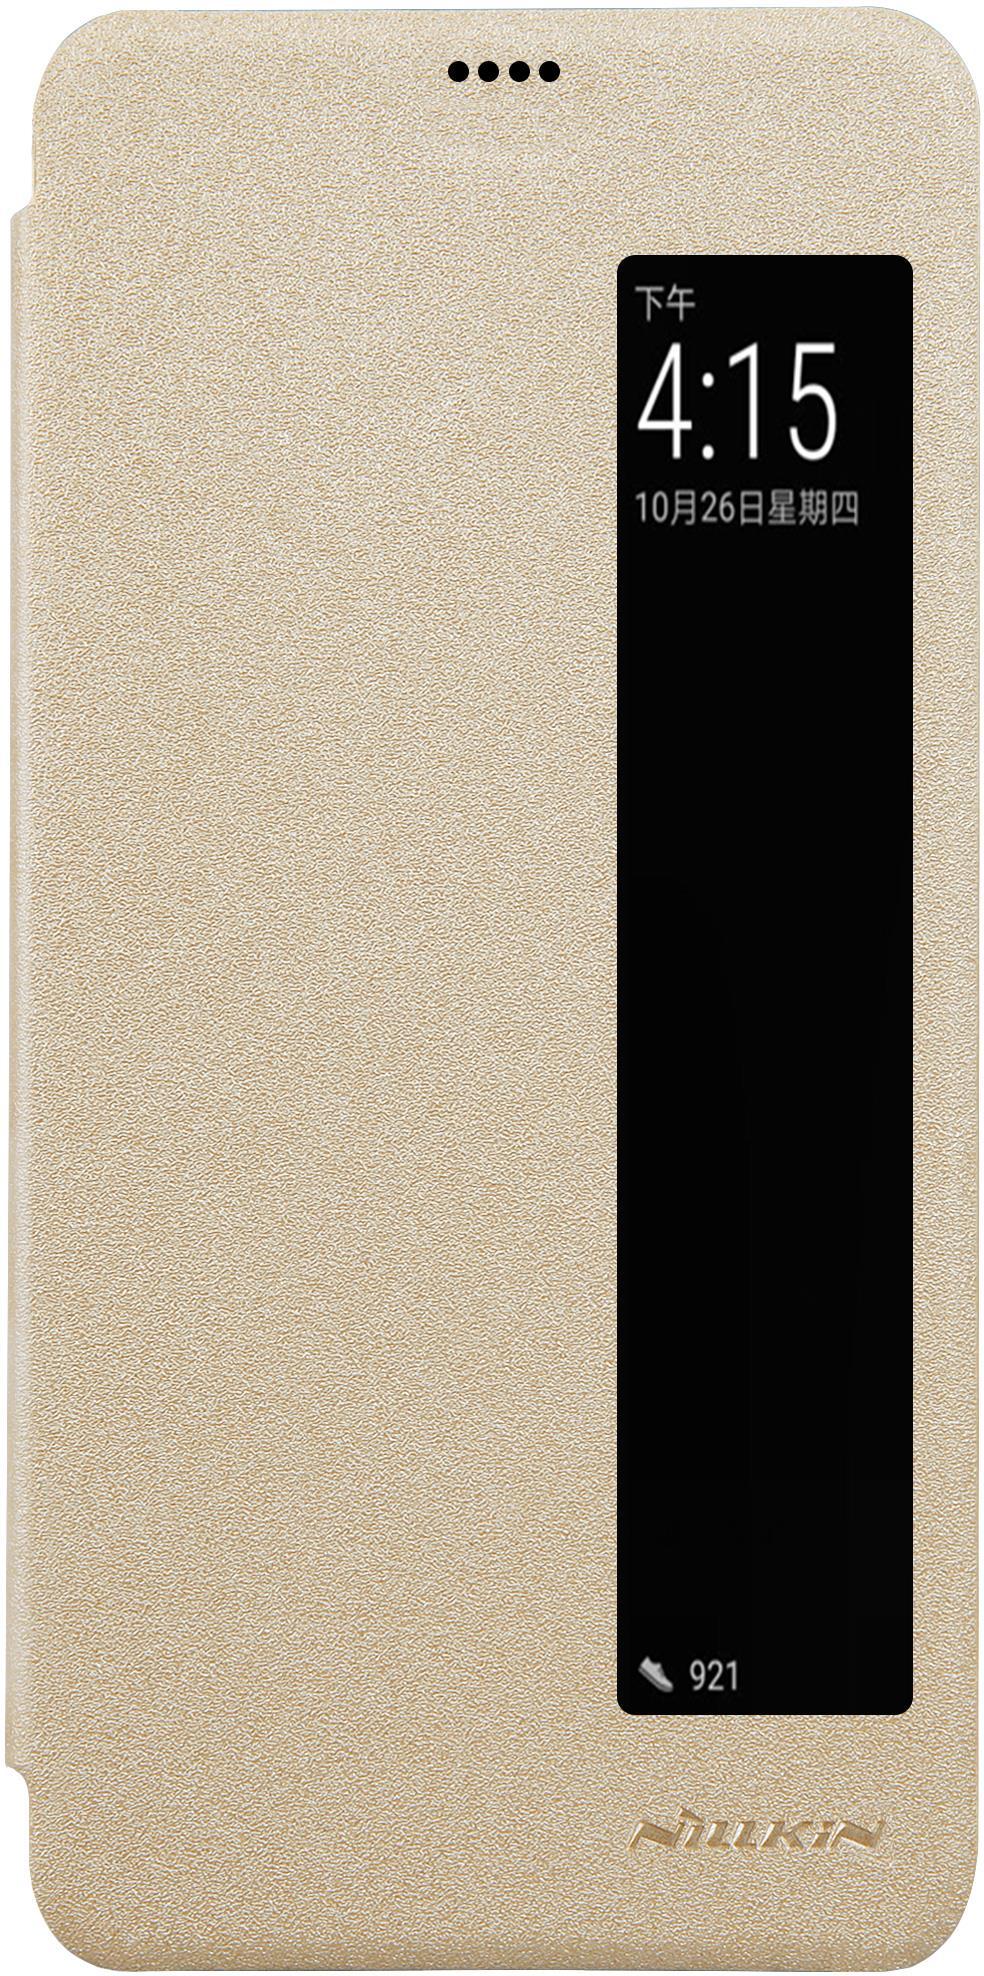 Чехол для сотового телефона Nillkin T-N-HP20P-009, золотой чехол nillkin sparkle leather case для apple iphone 6 plus цвет белый t n aiphone6p 009